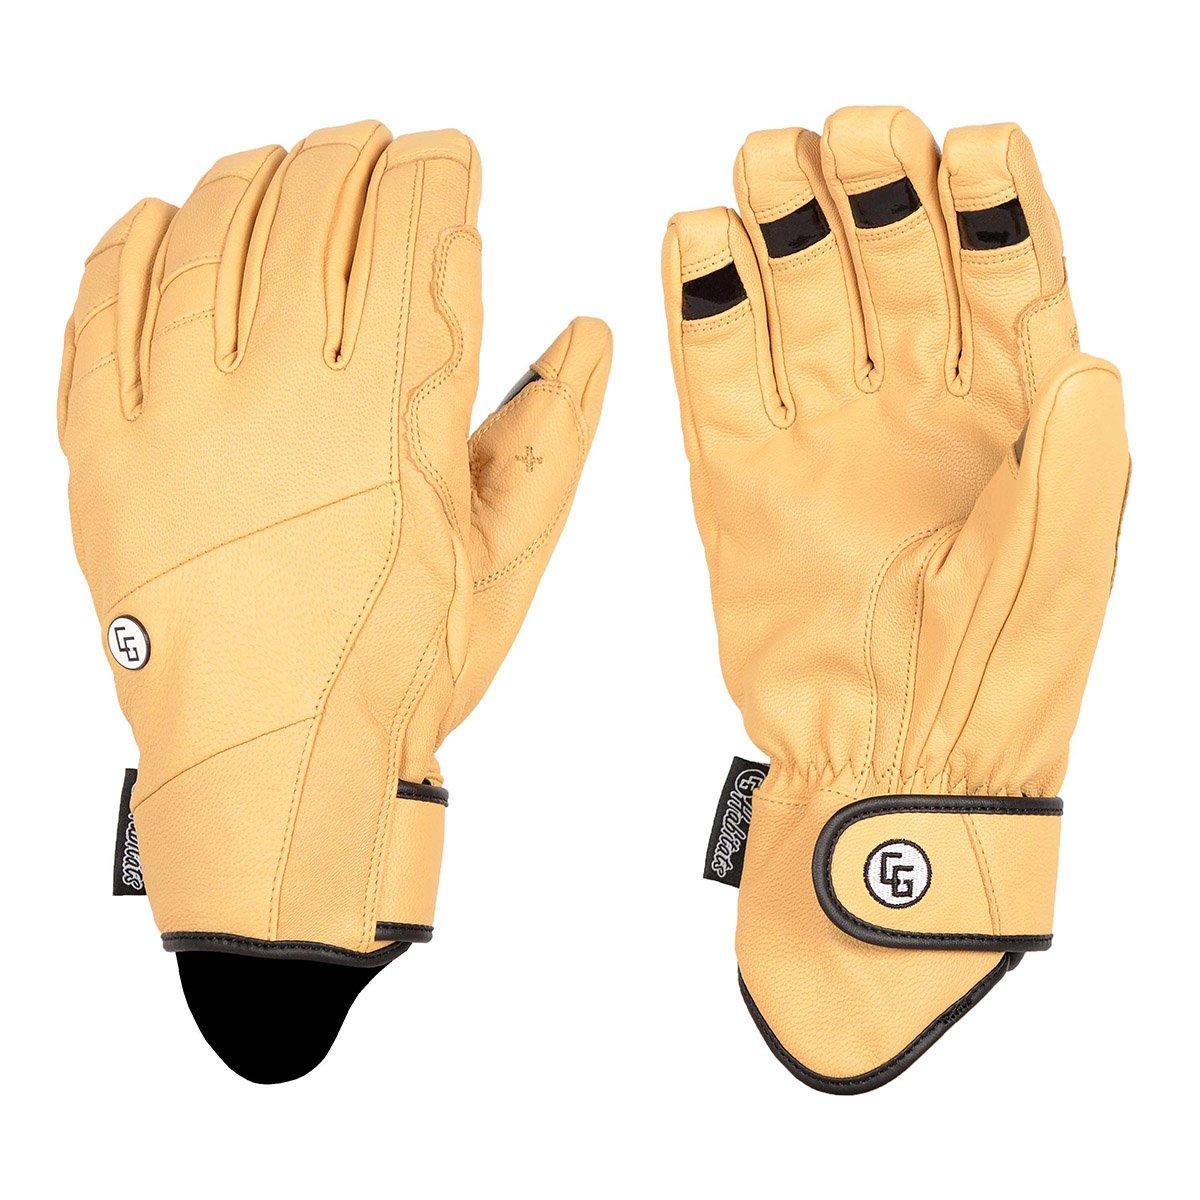 CG Habitats Gloves